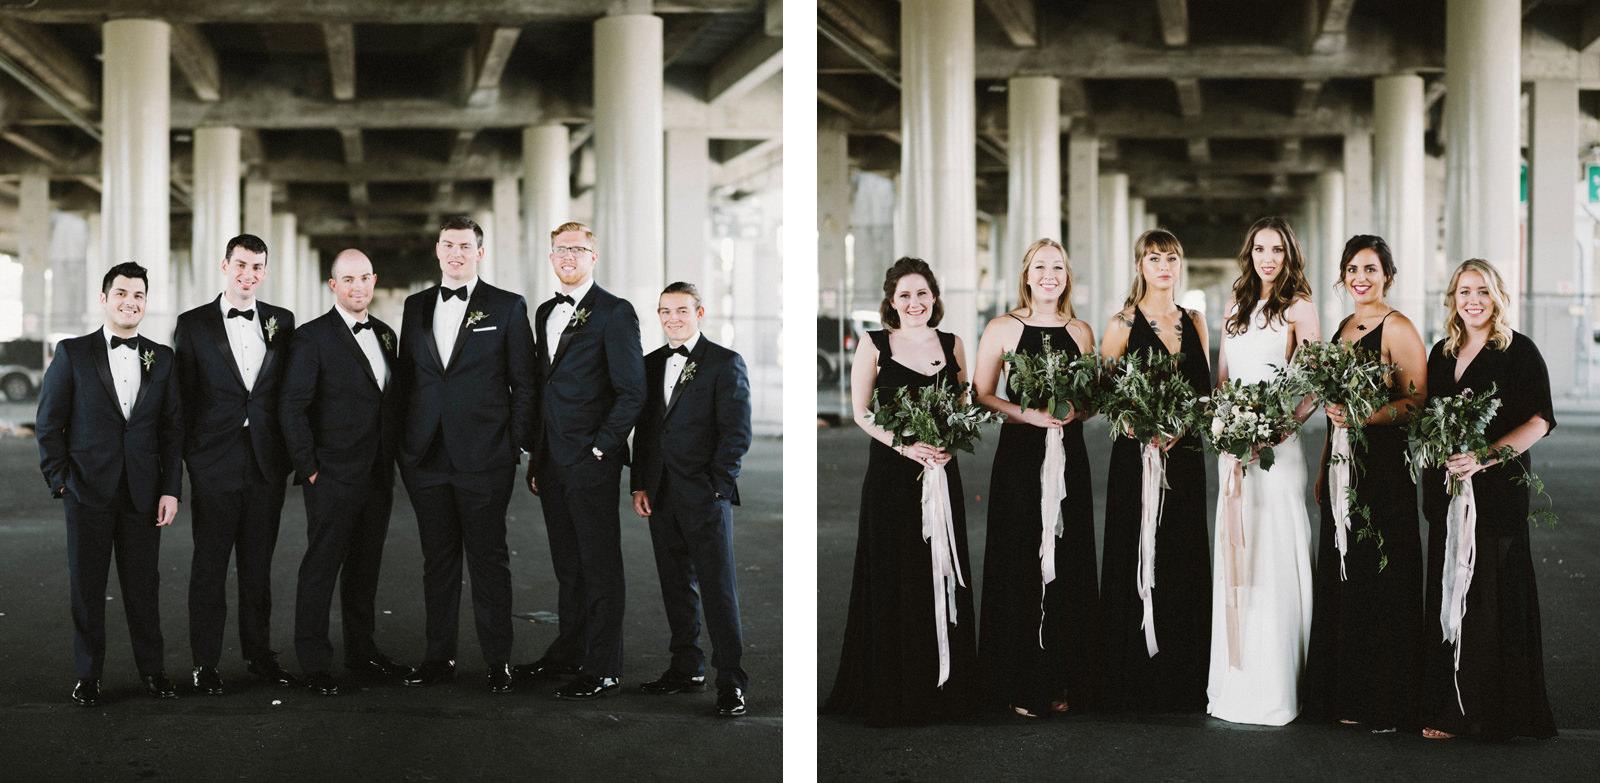 sodo-park-wedding-018 SODO PARK WEDDING